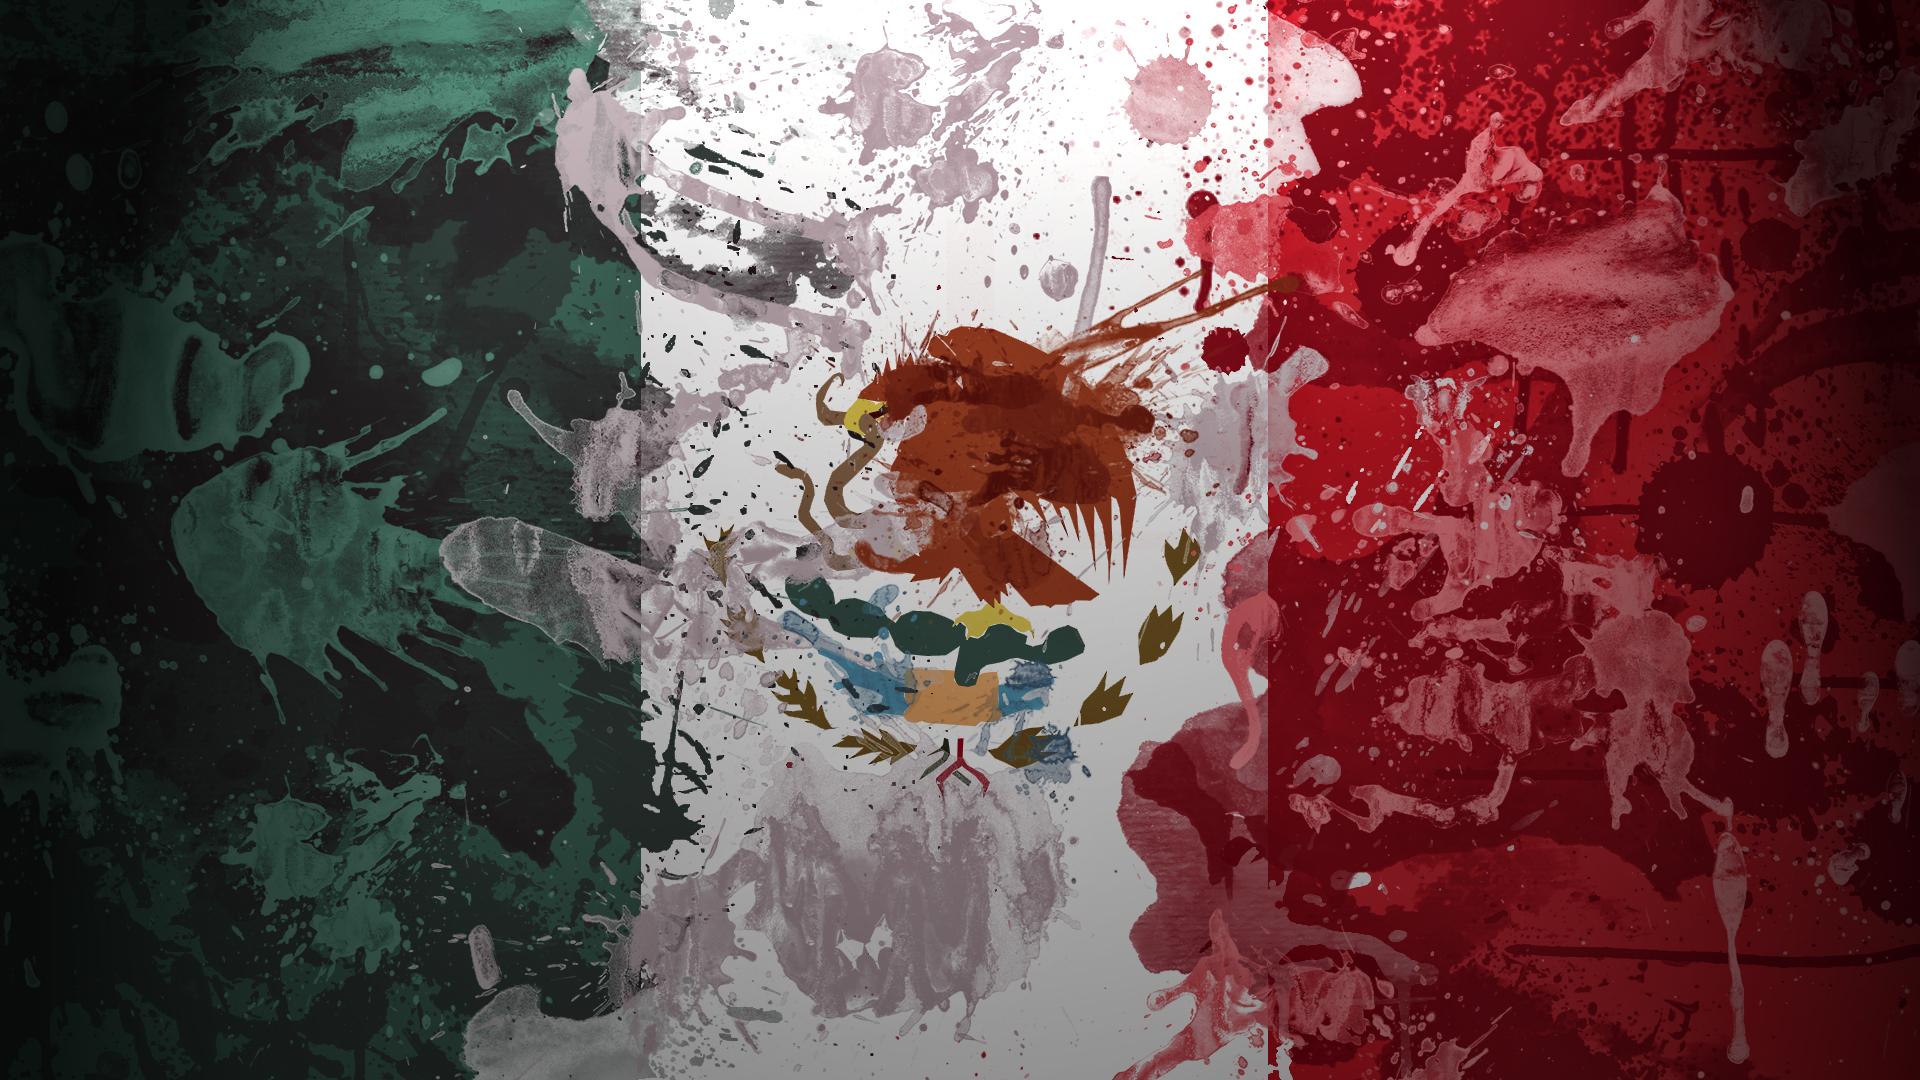 Mexican Flag Wallpaper HDjpg   Clip Art Library 1920x1080